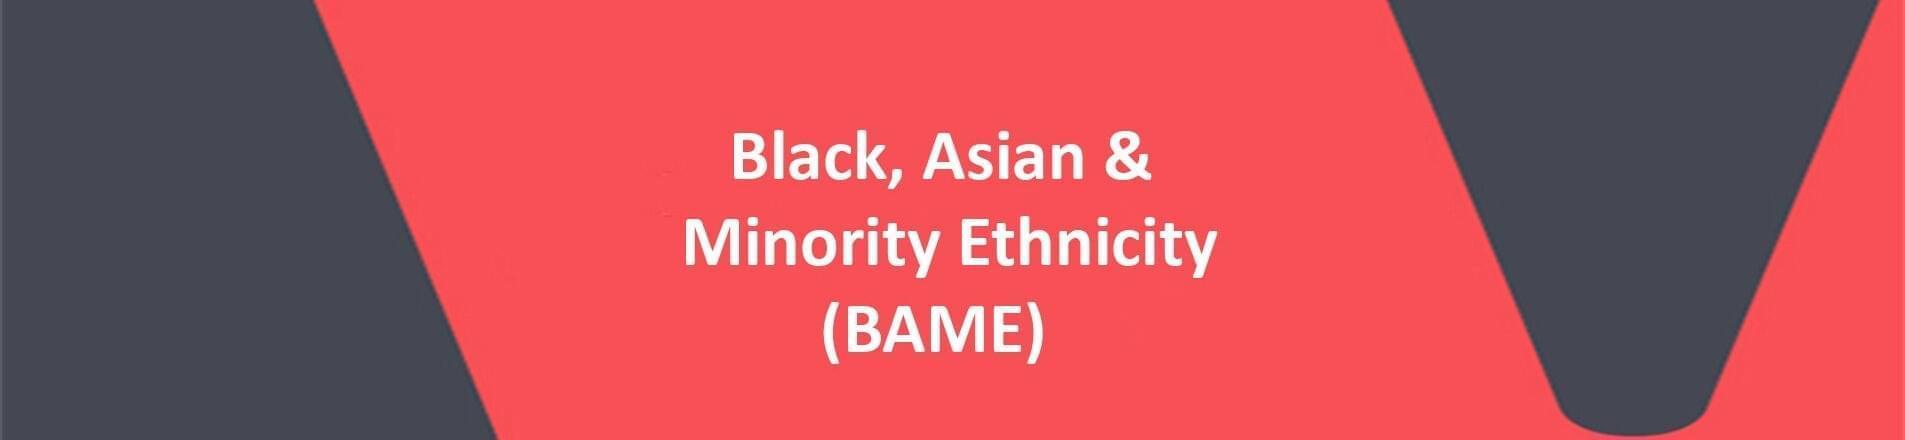 Black, Asian & Minority Ethnicity (BAME) on VERCIDA background